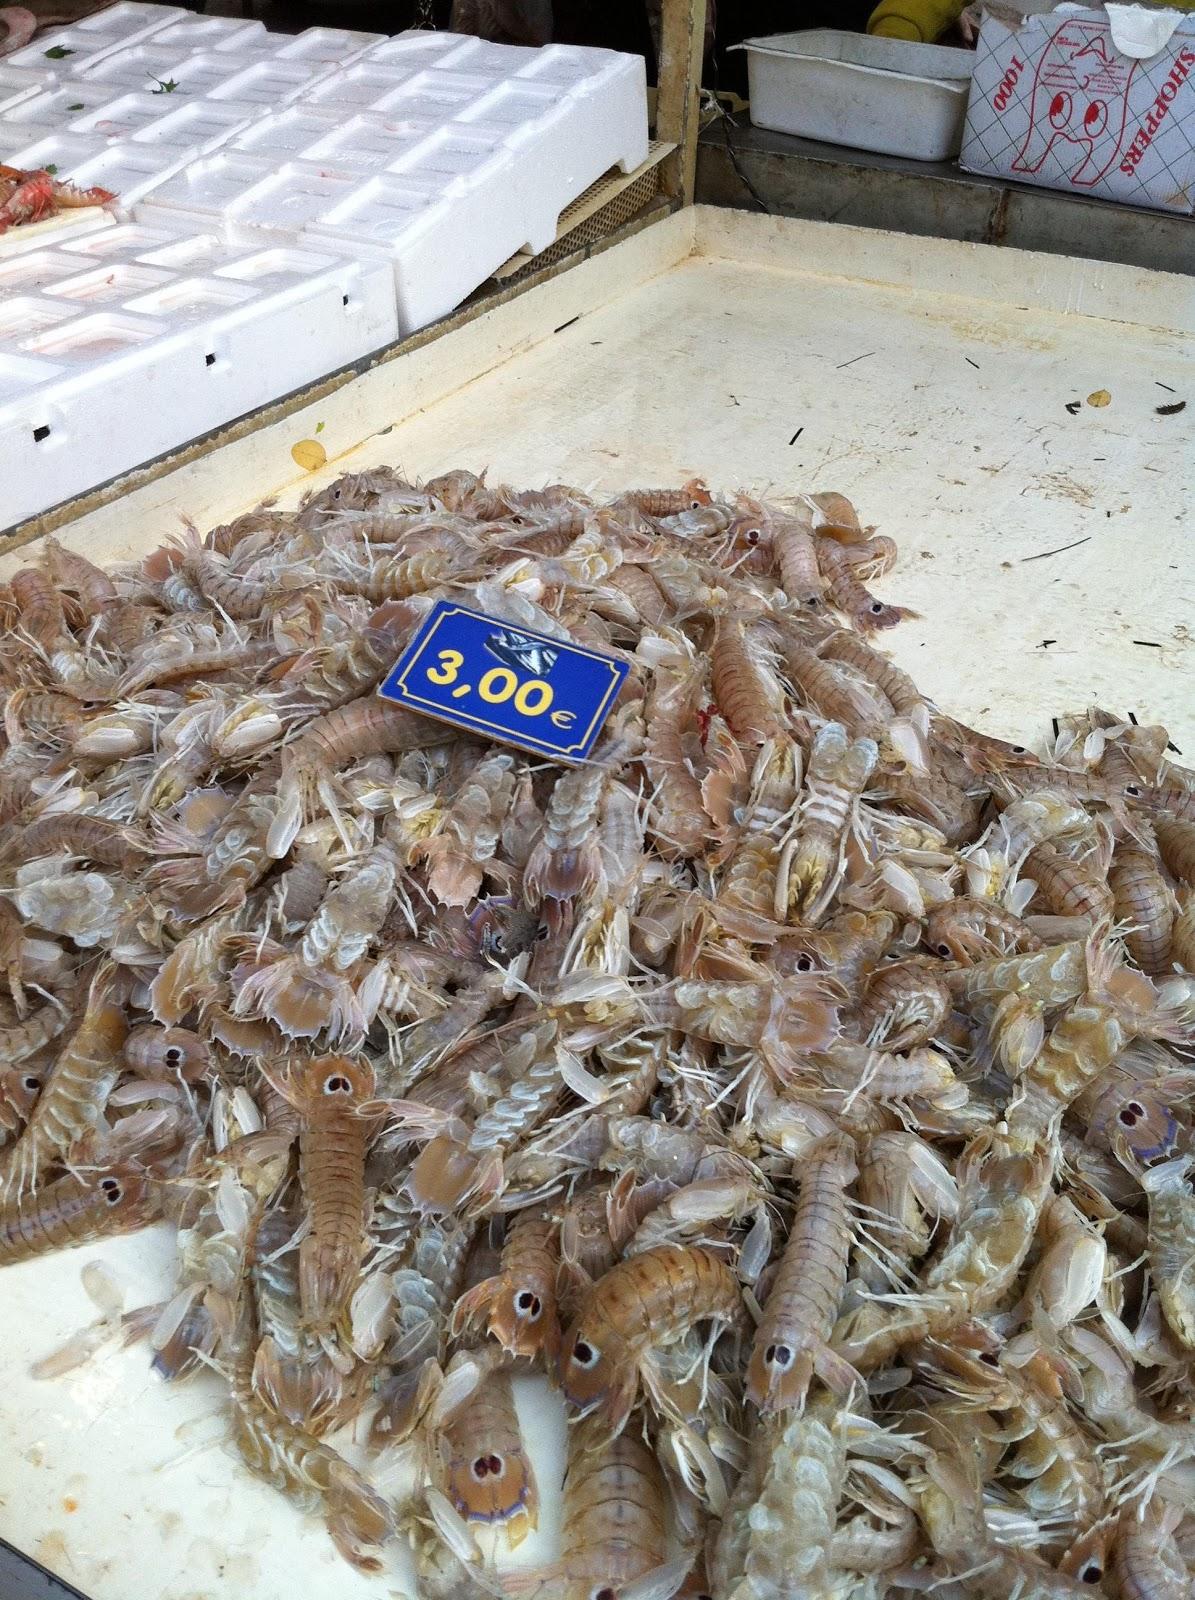 La Cucina Economica: Canocchie, pannocchie o cicale di mare?